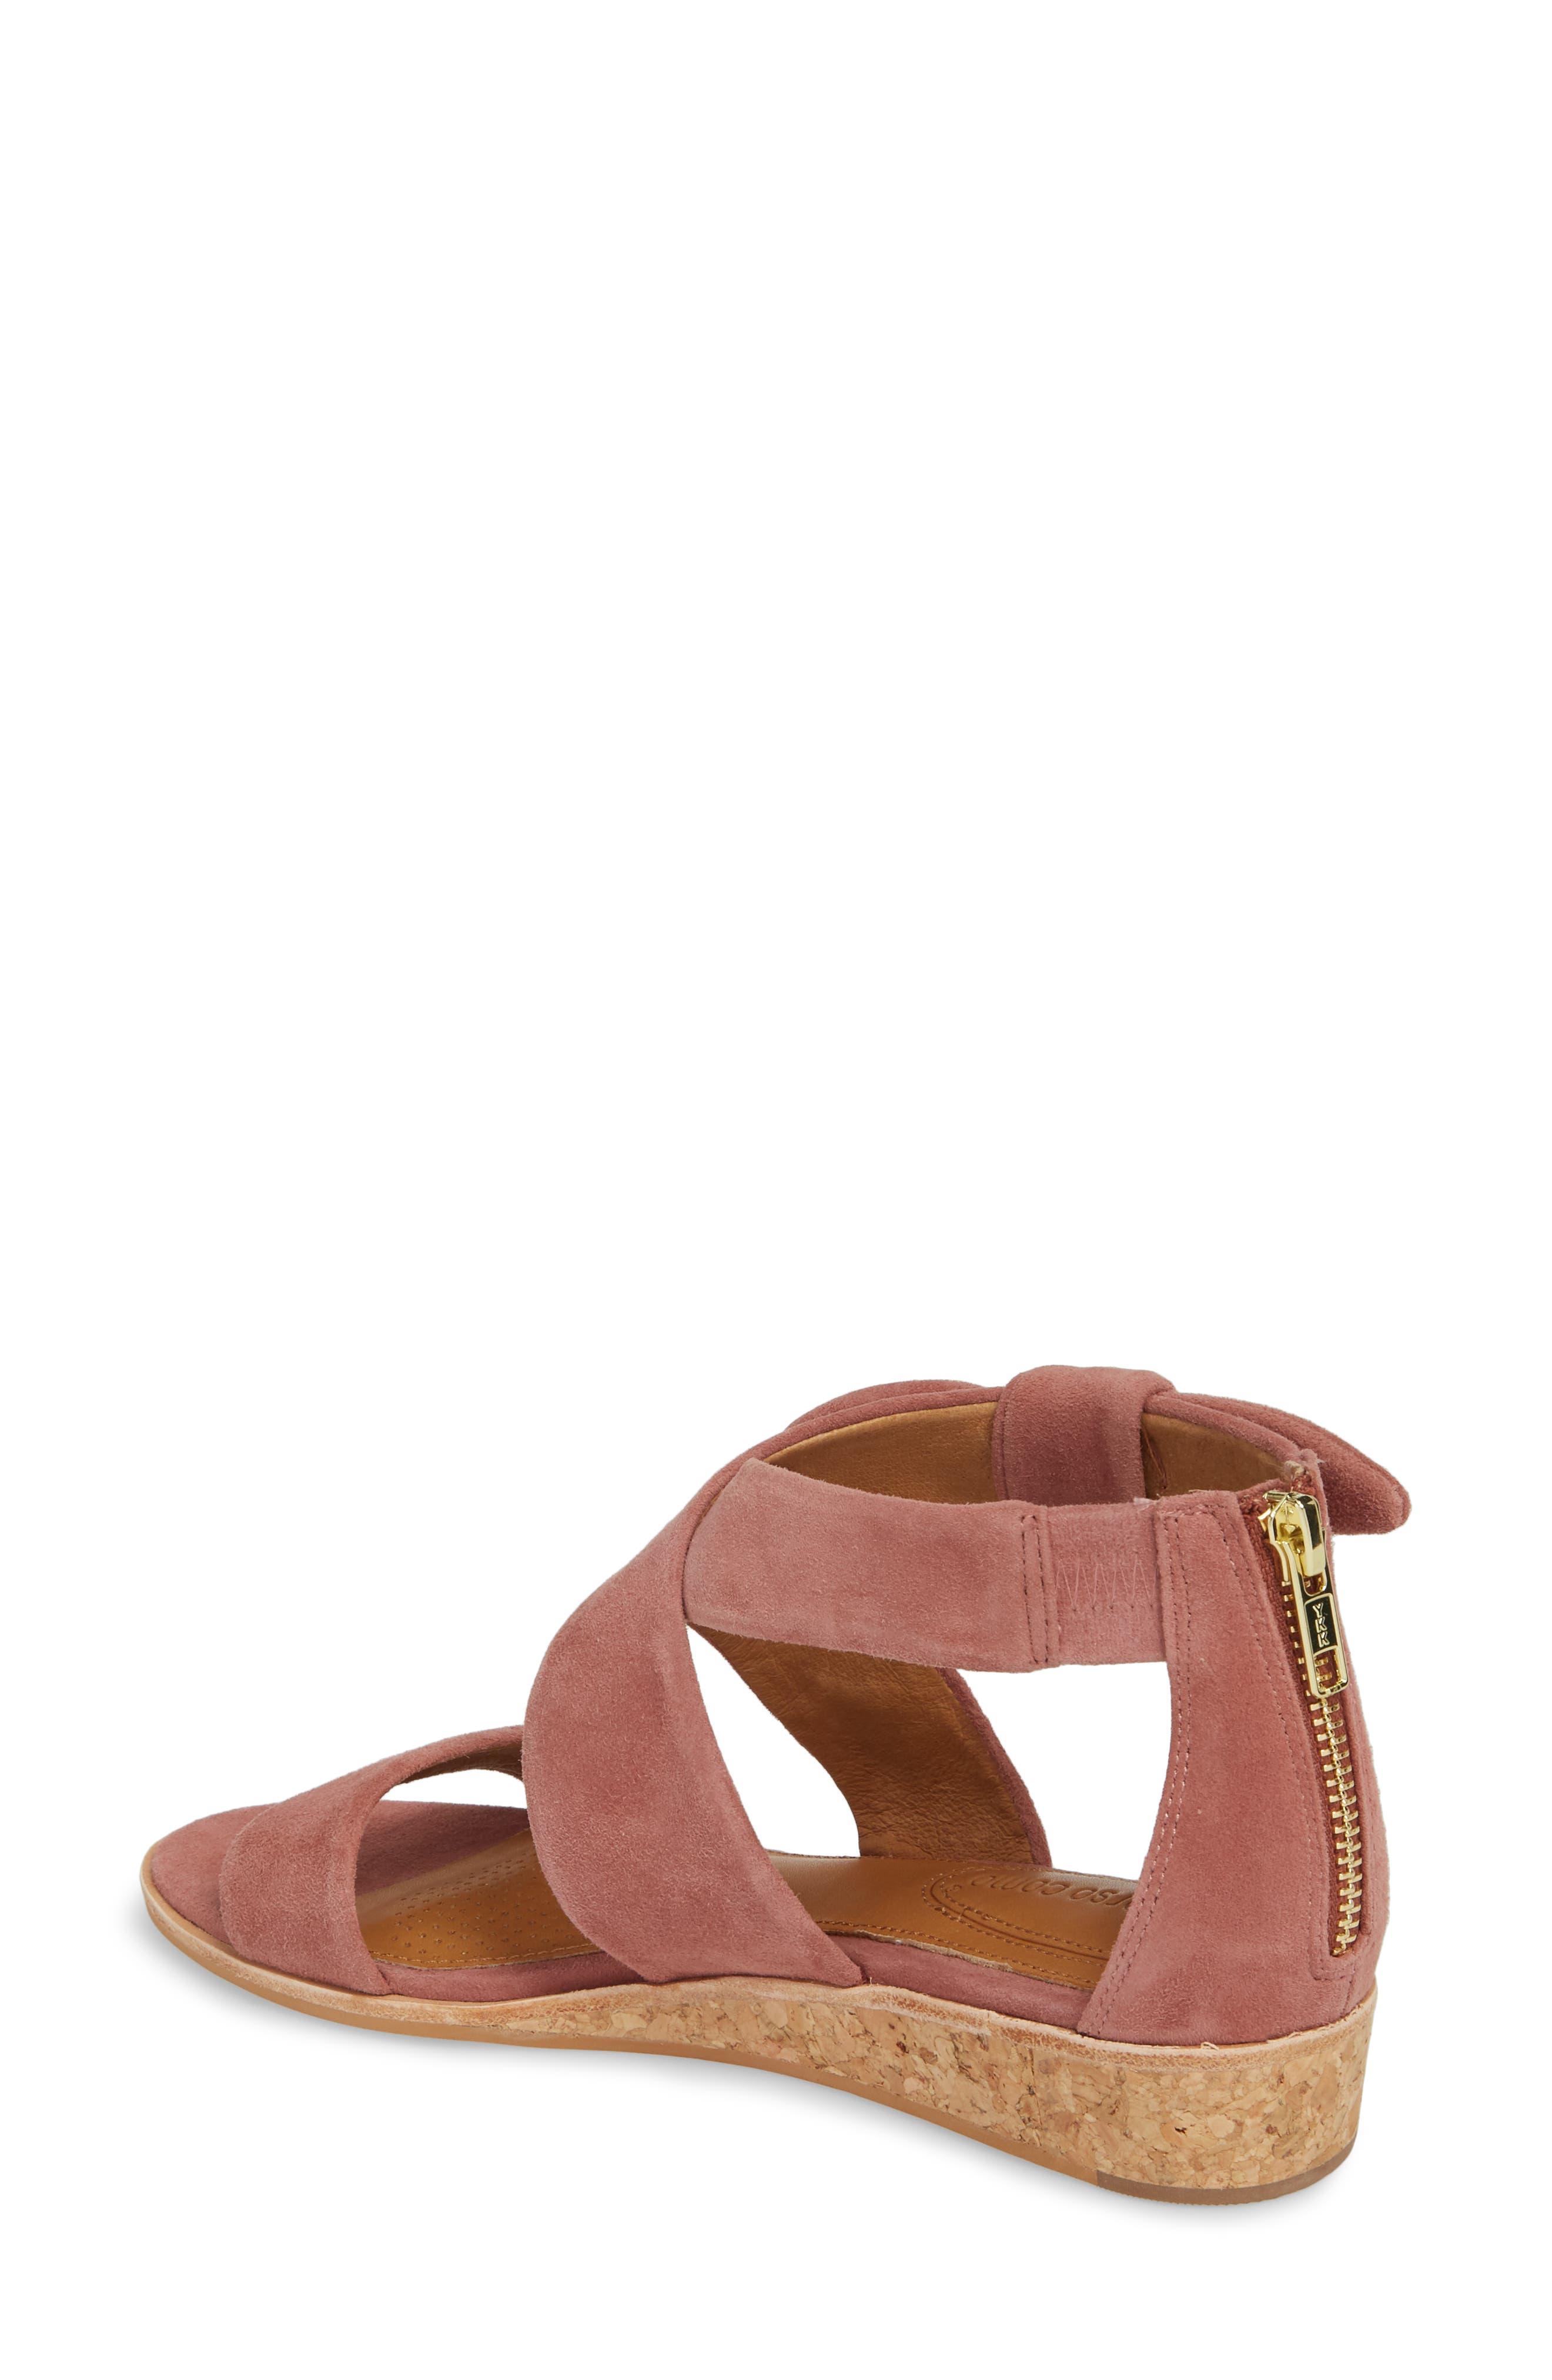 Rasque Sandal,                             Alternate thumbnail 2, color,                             Old Rose Leather